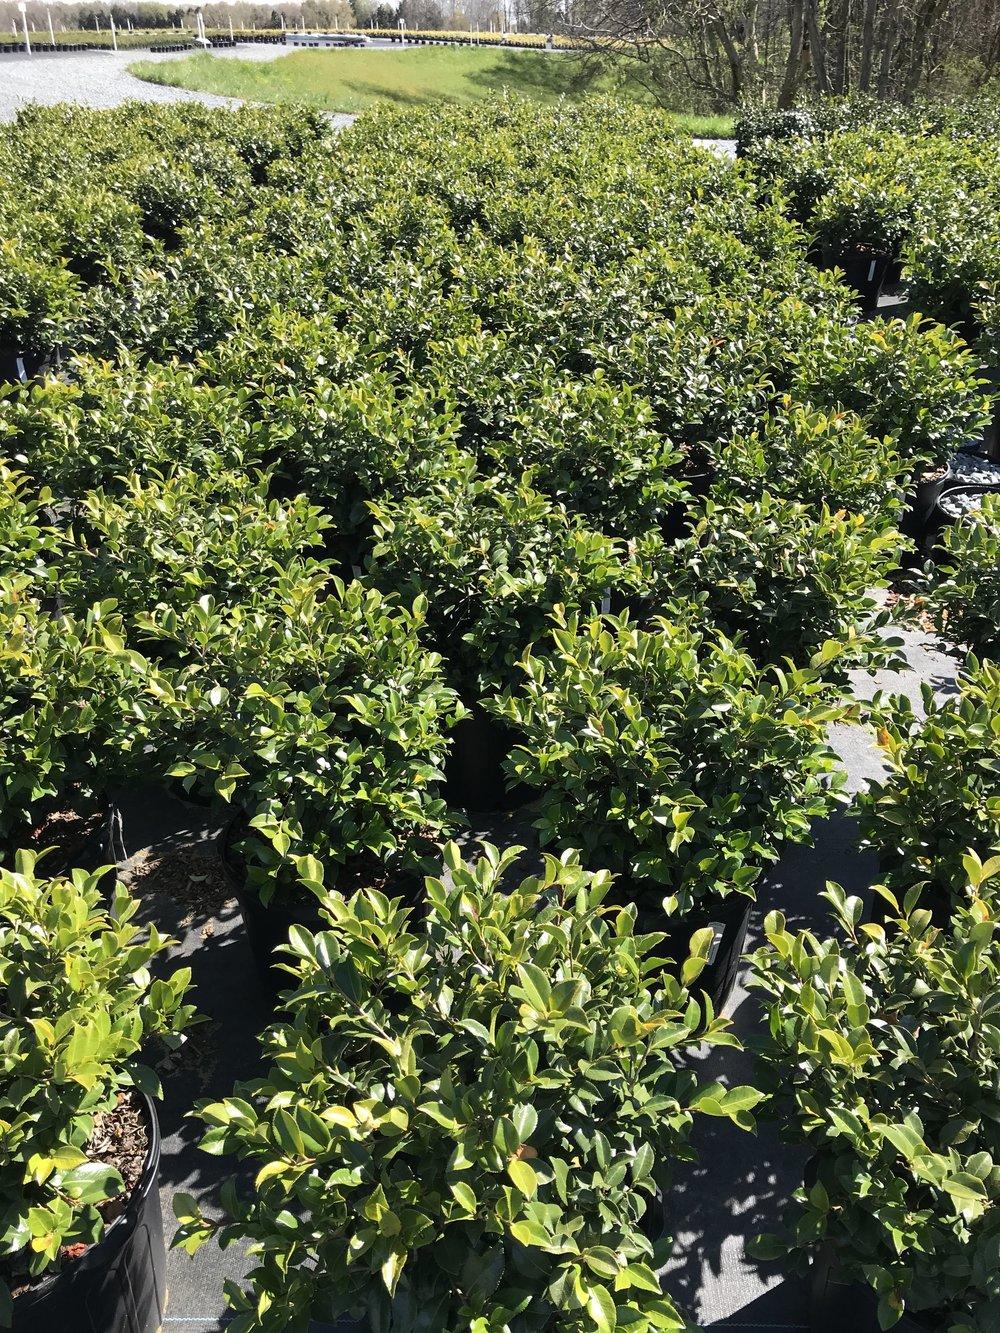 Camellia sasanqua 'Hot Flash' 7 gallon